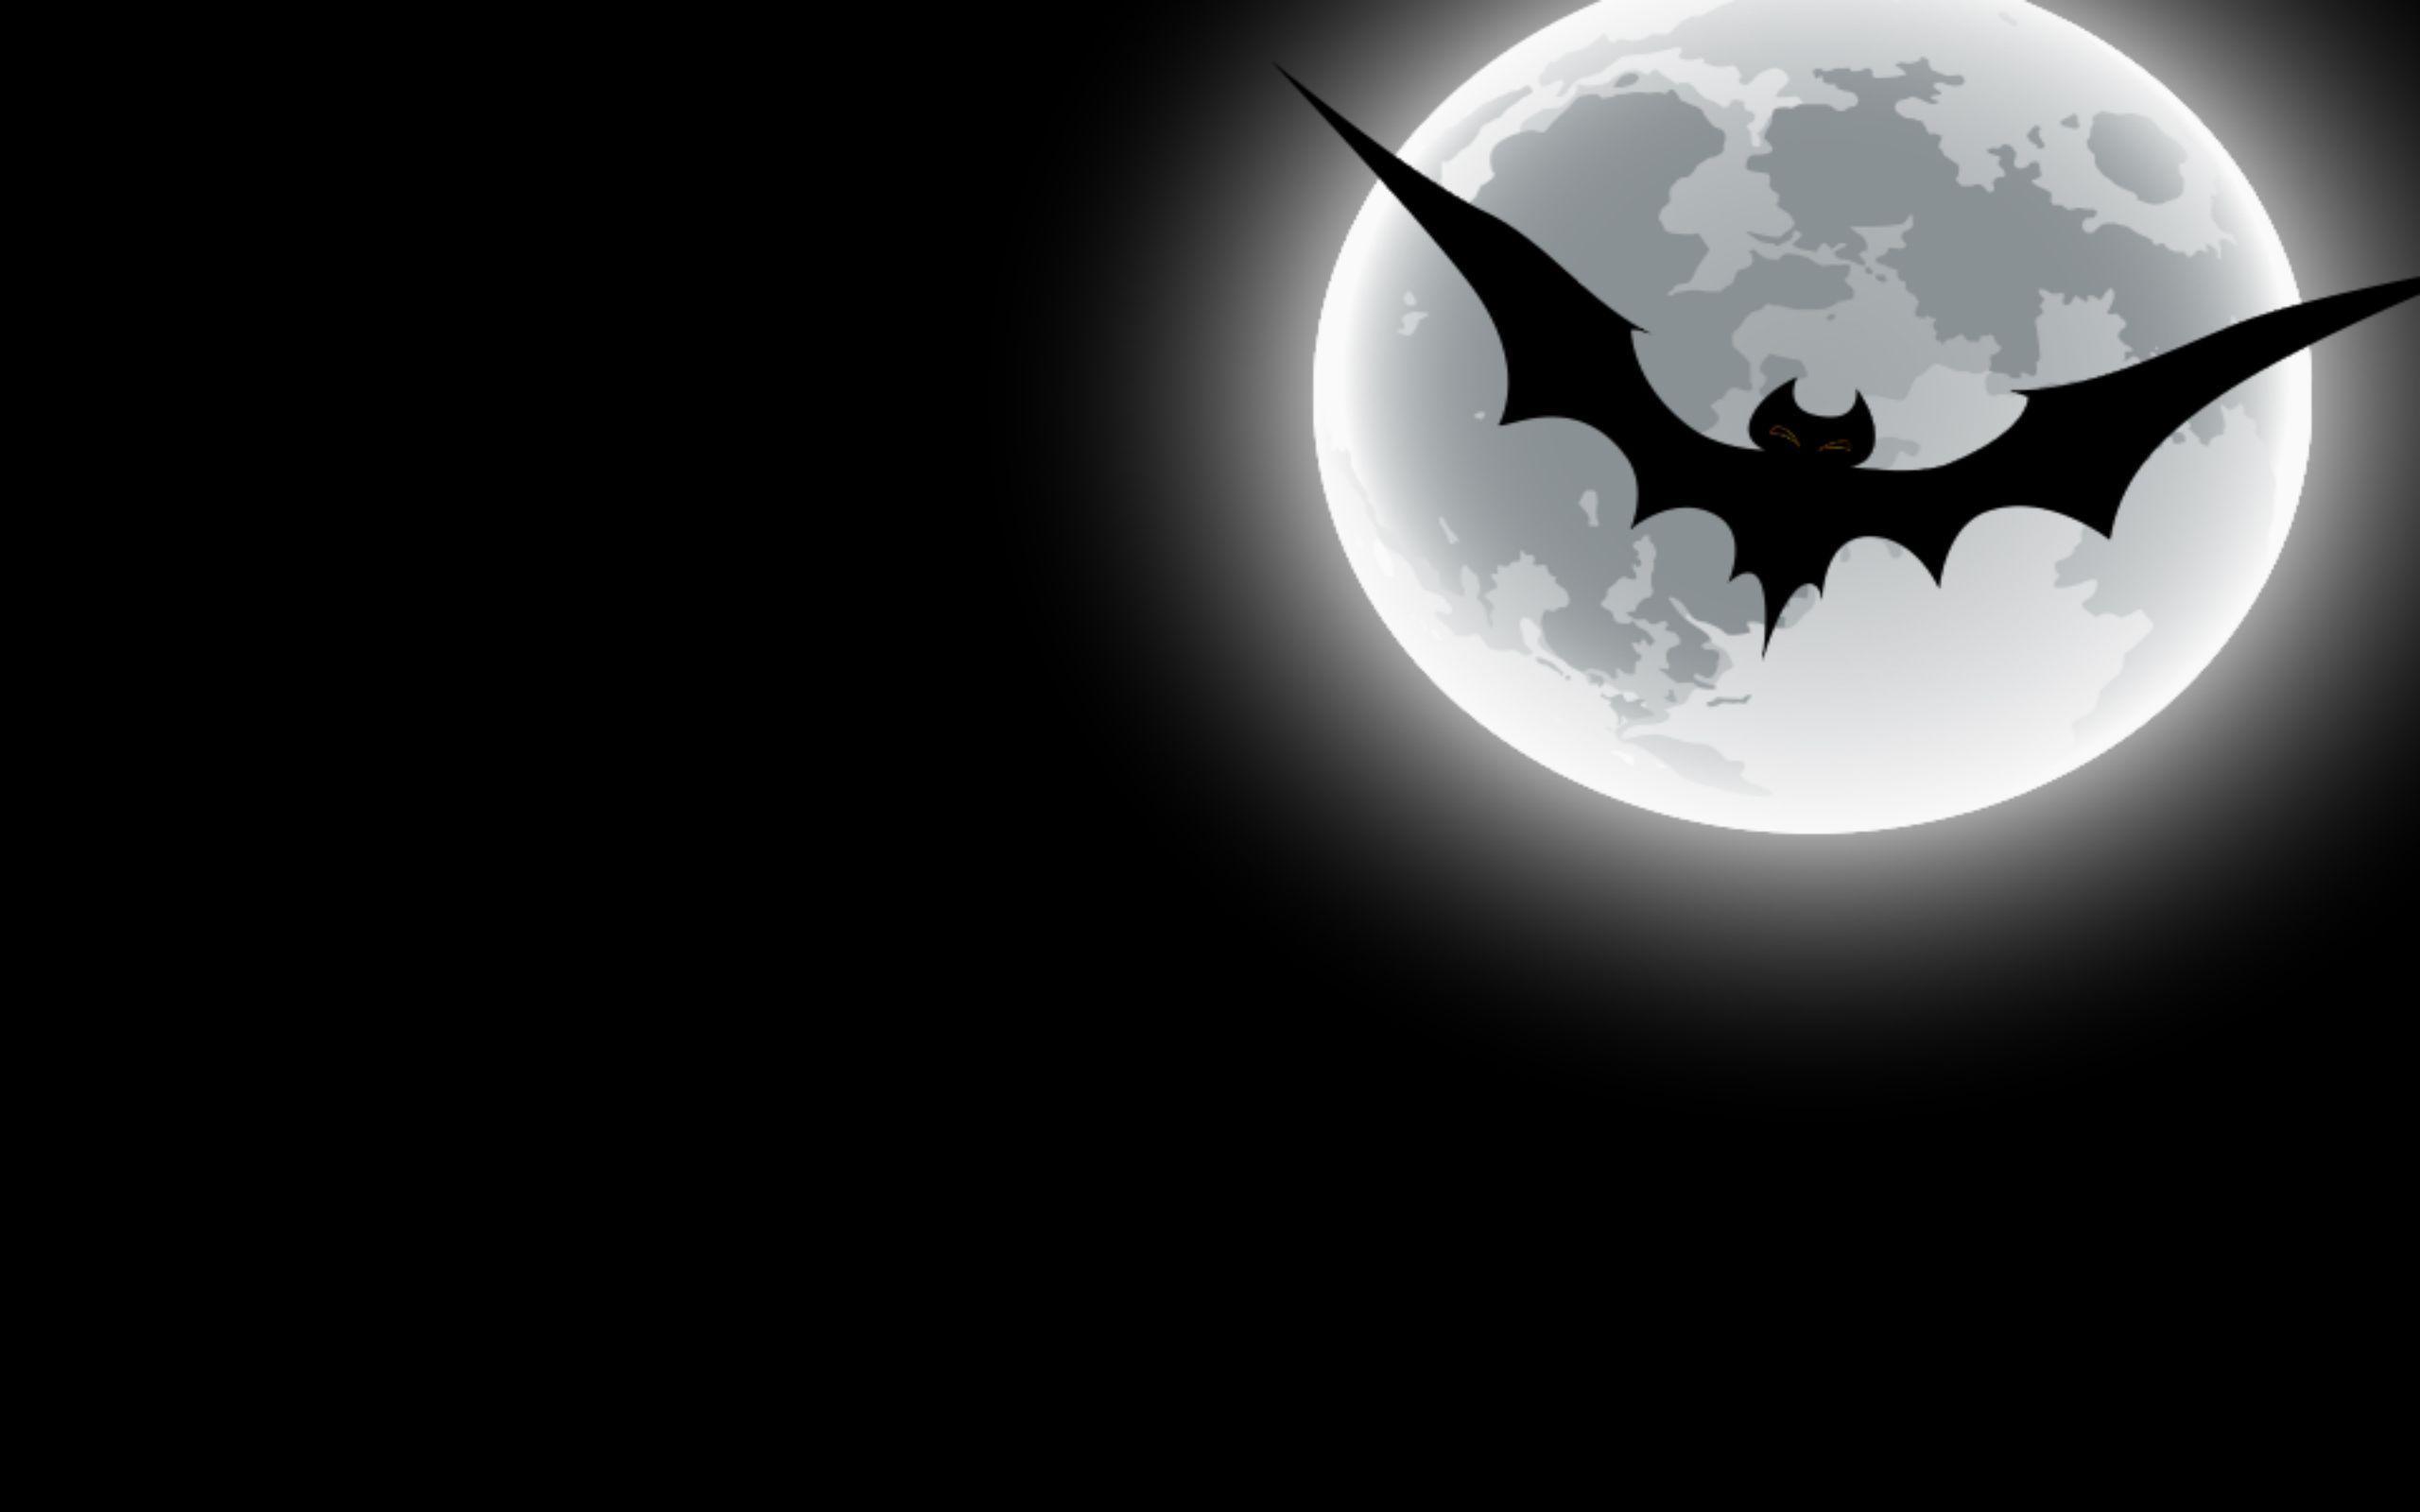 Bat Wallpaper – The Coolest wallpaper design ideas